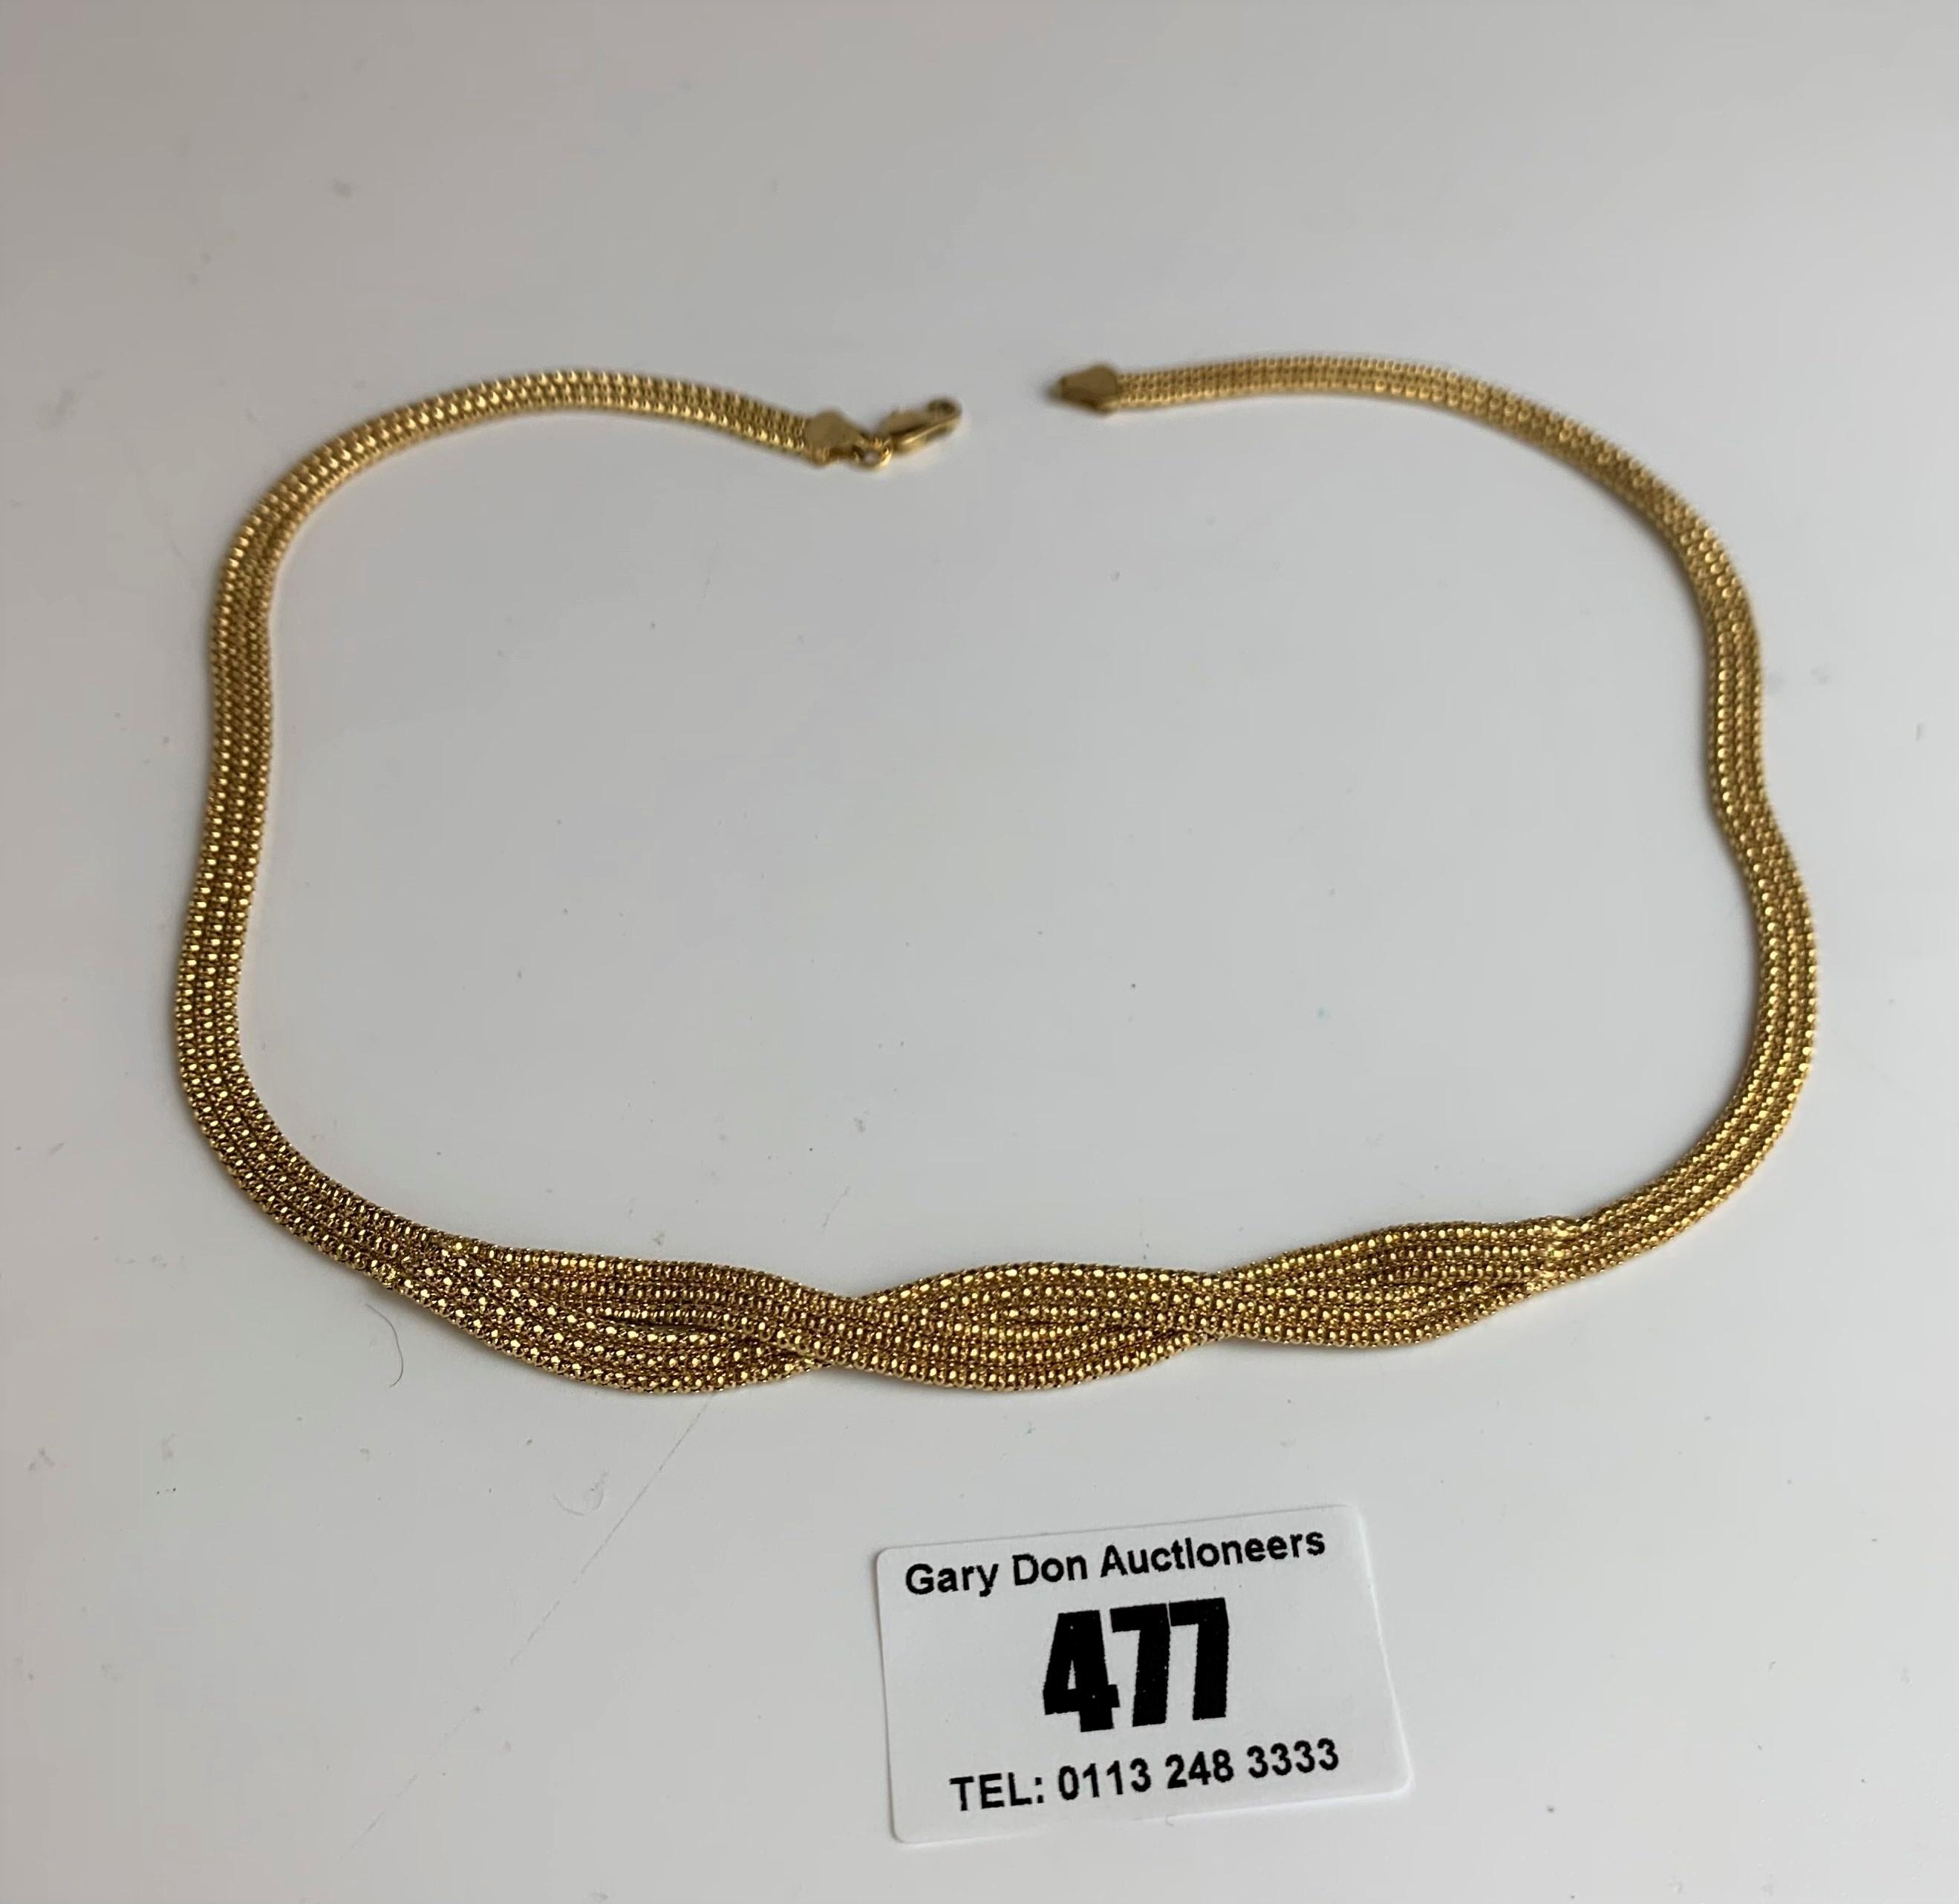 "9k gold necklace, length 16.5"", w: 11.4 gms - Image 2 of 5"